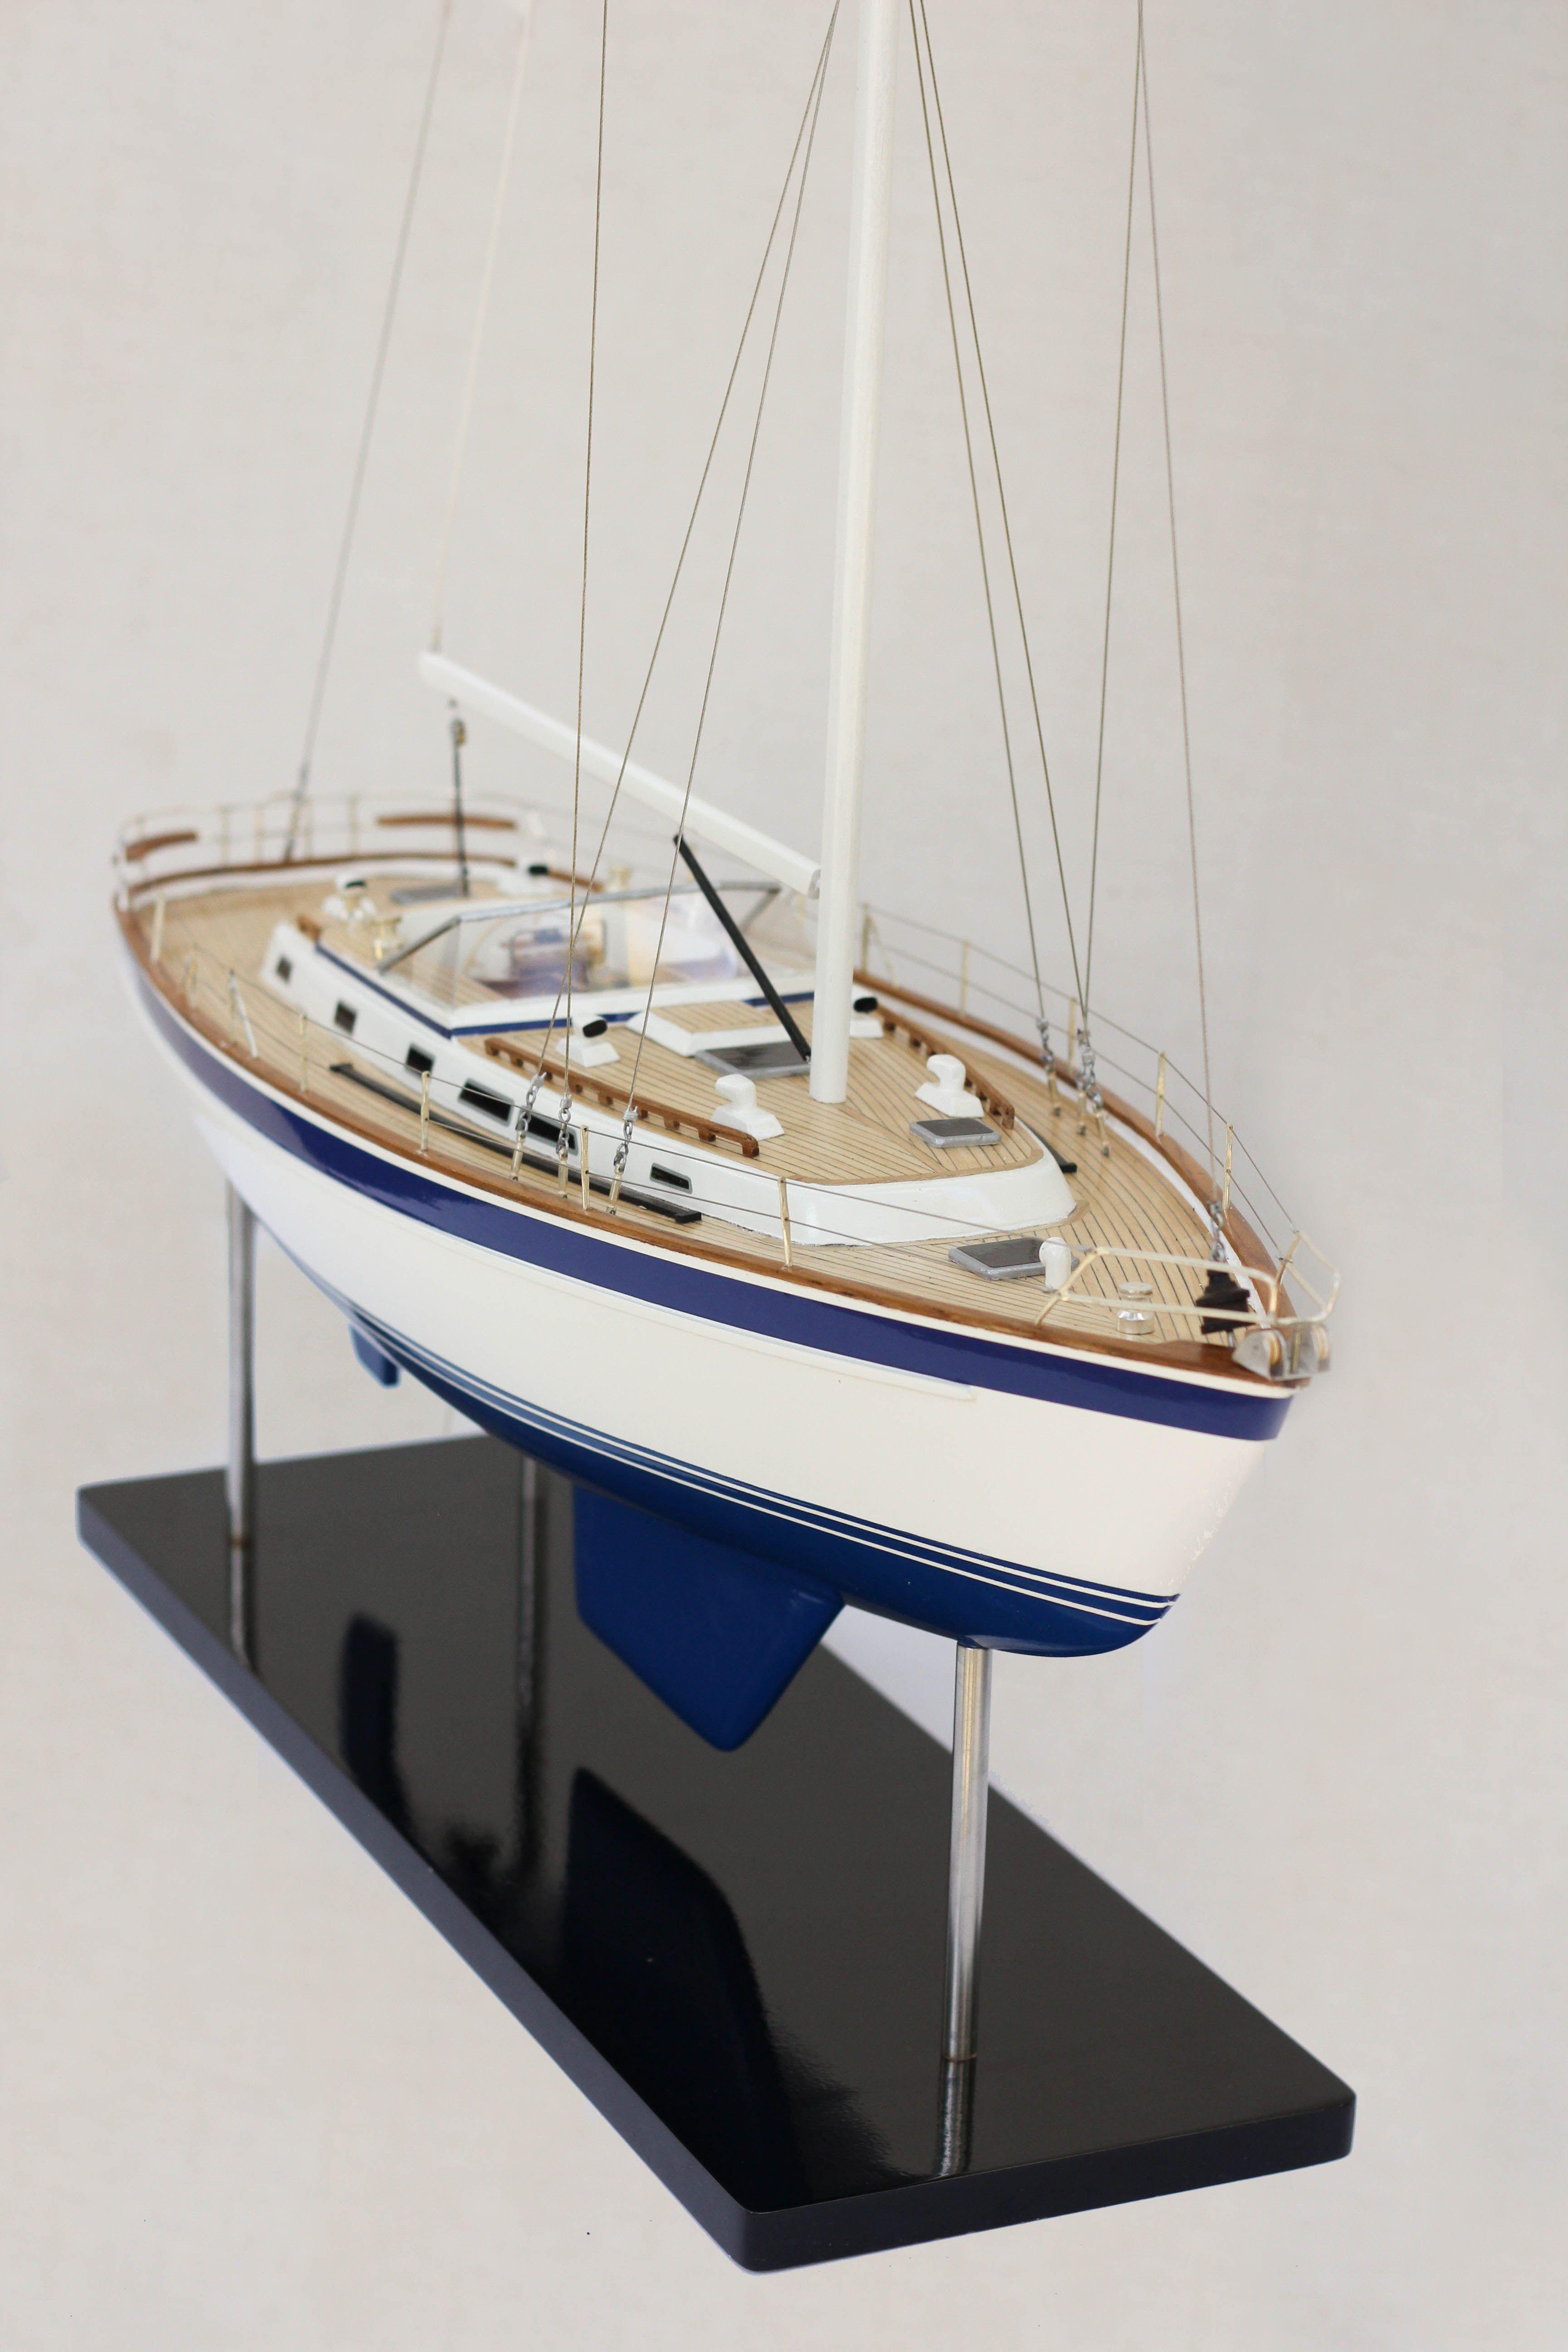 2541-14444-Halberg-Rassy-42-Model-Sailing-Boat-Superior-Range